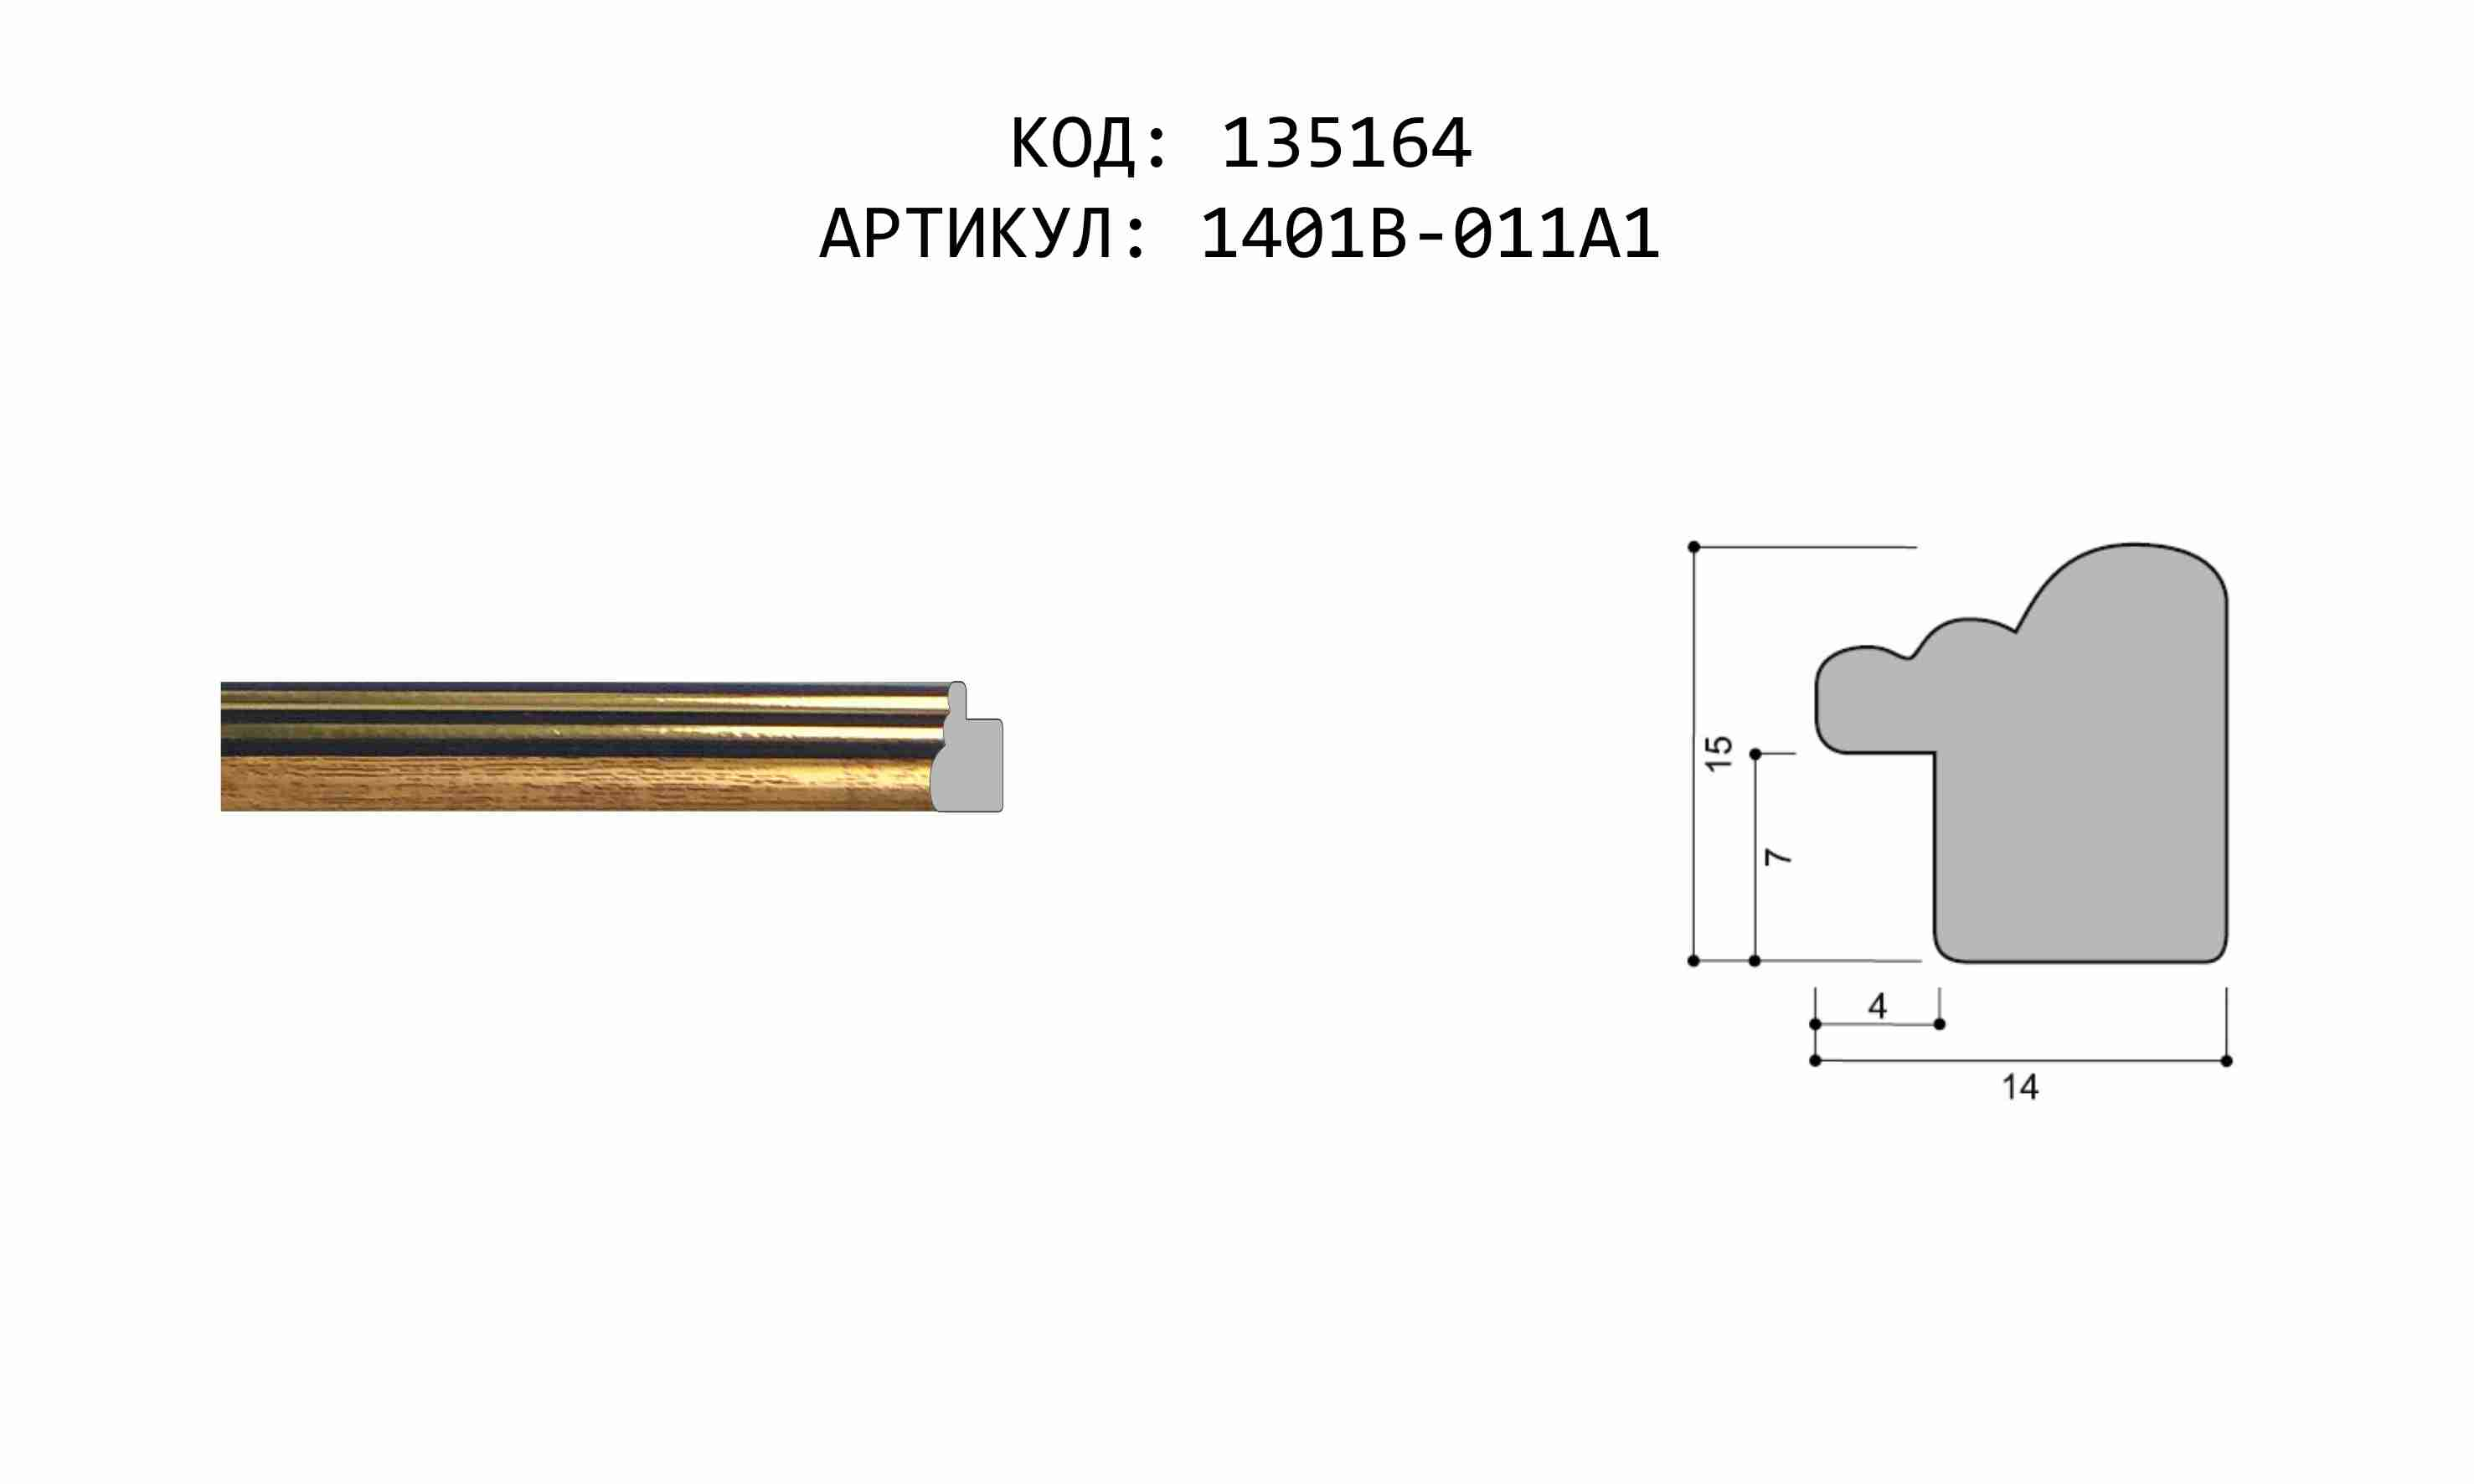 Артикул: 1401B-011A1